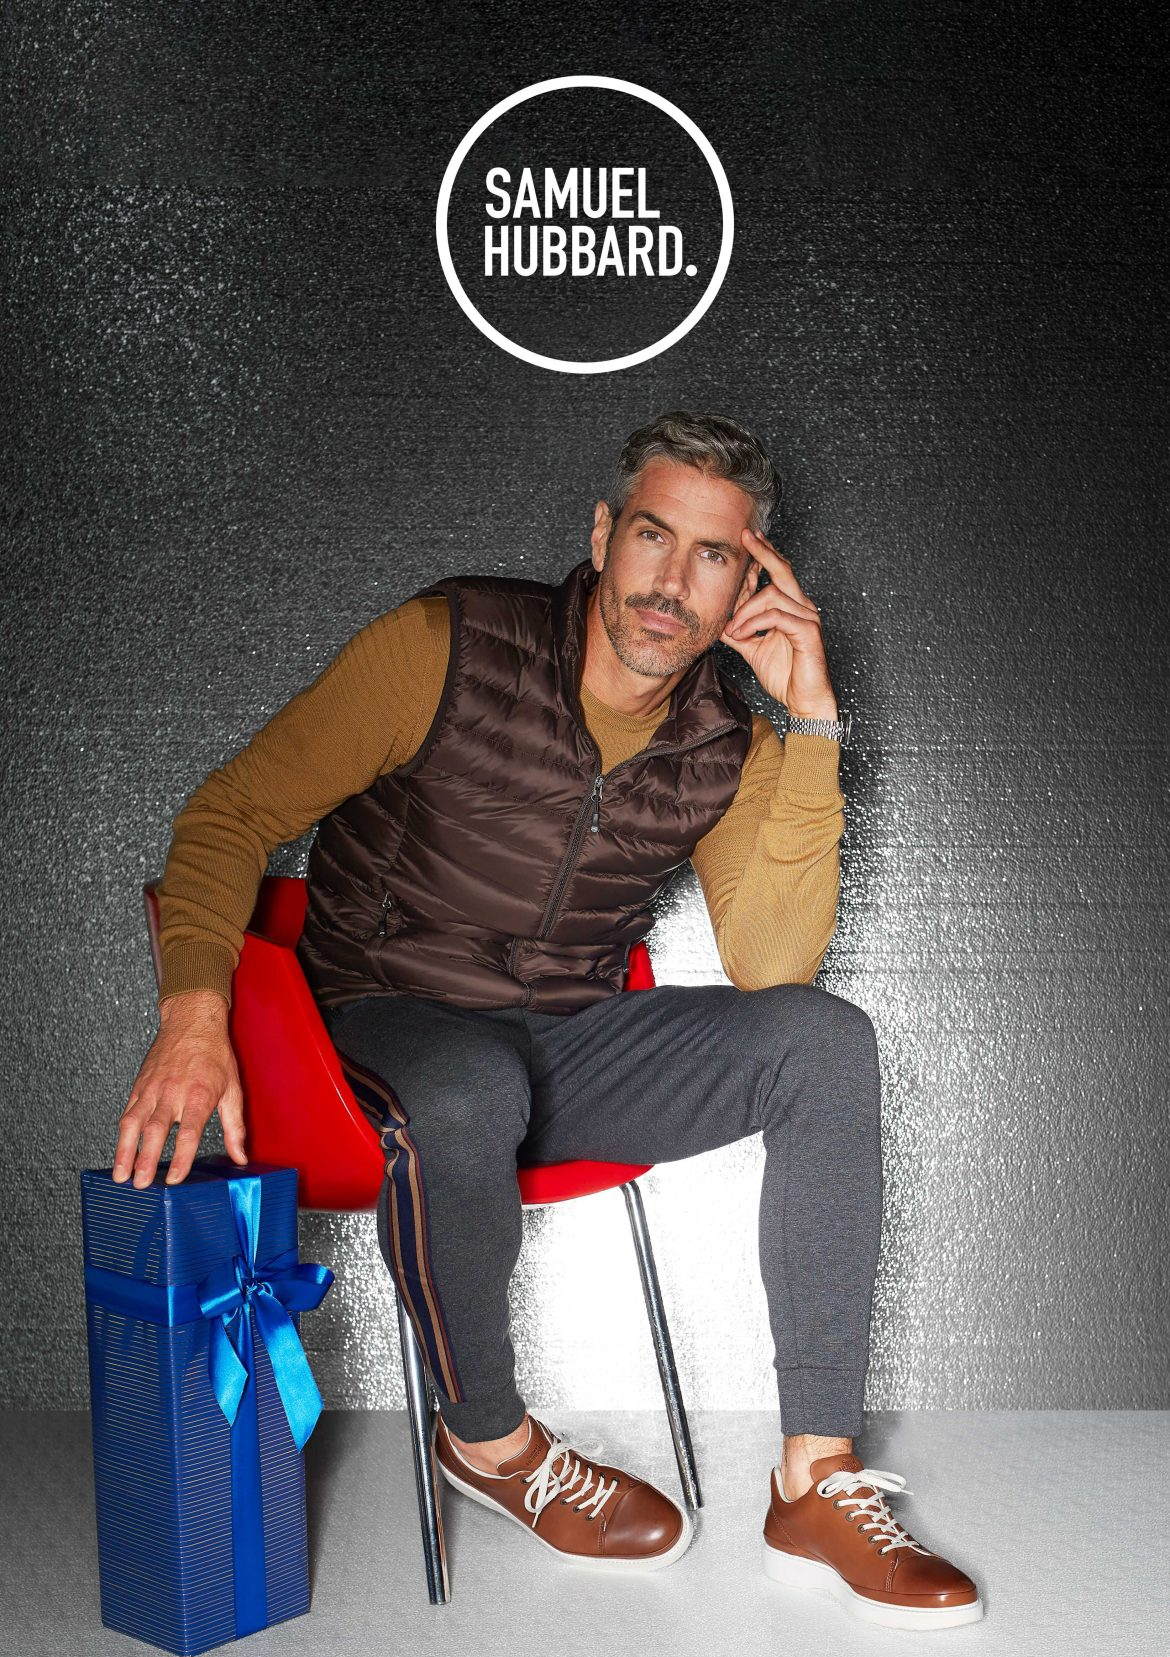 Need some new kicks?  Samuel Hubbard has everything on sale